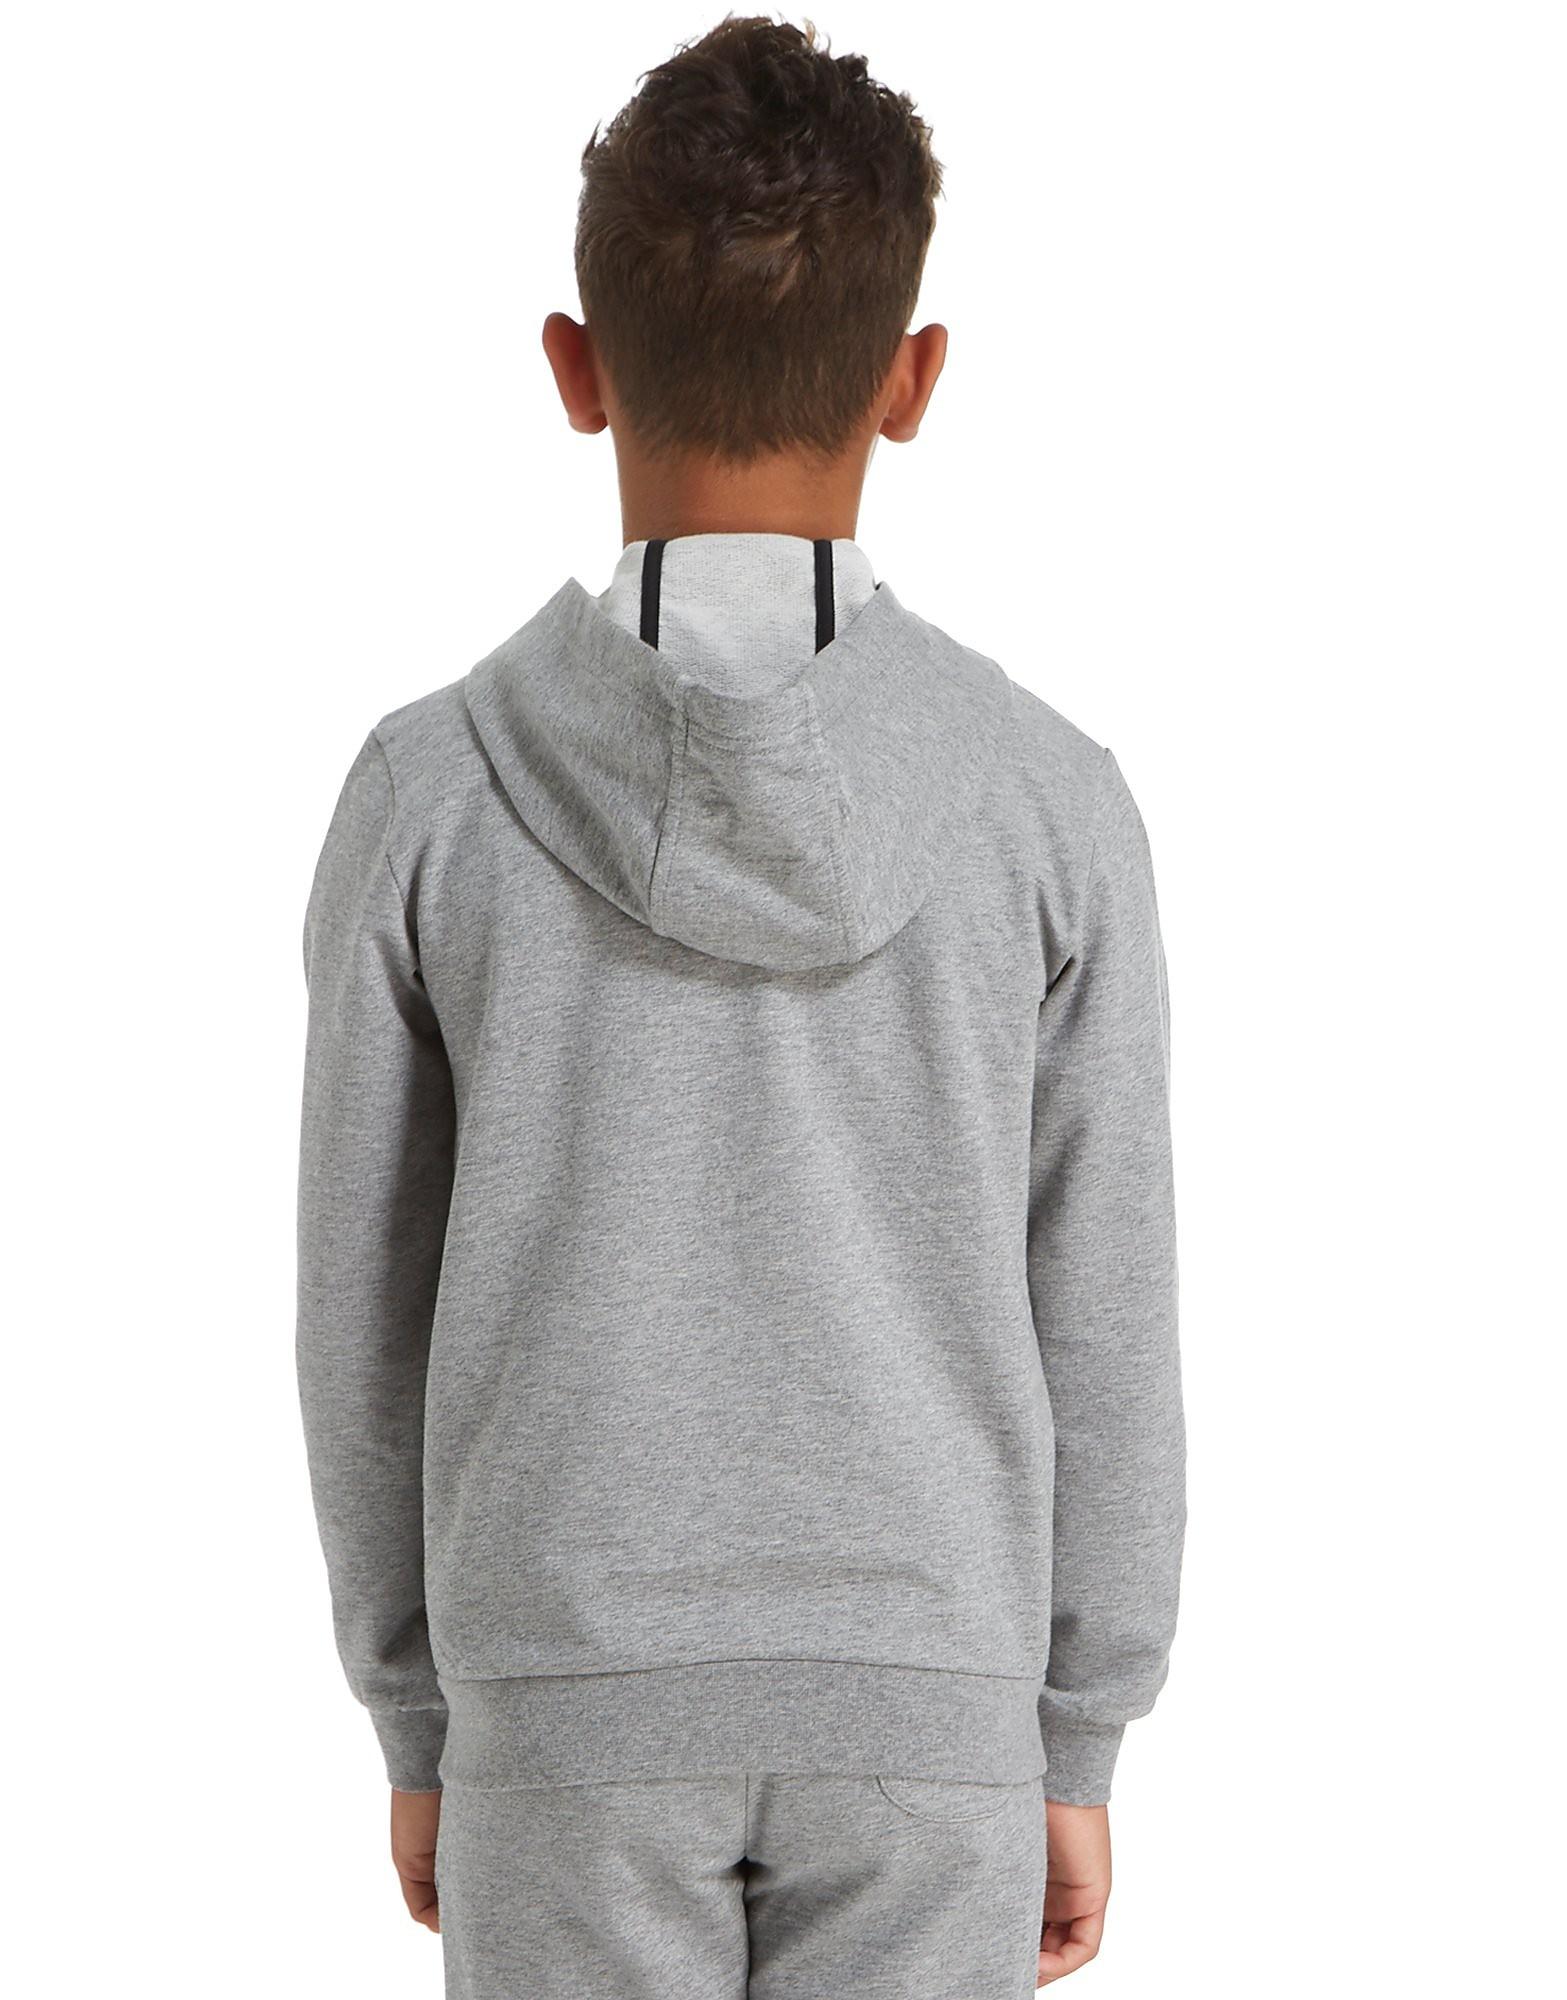 Emporio Armani EA7 Core Full Zip Hoody Junior